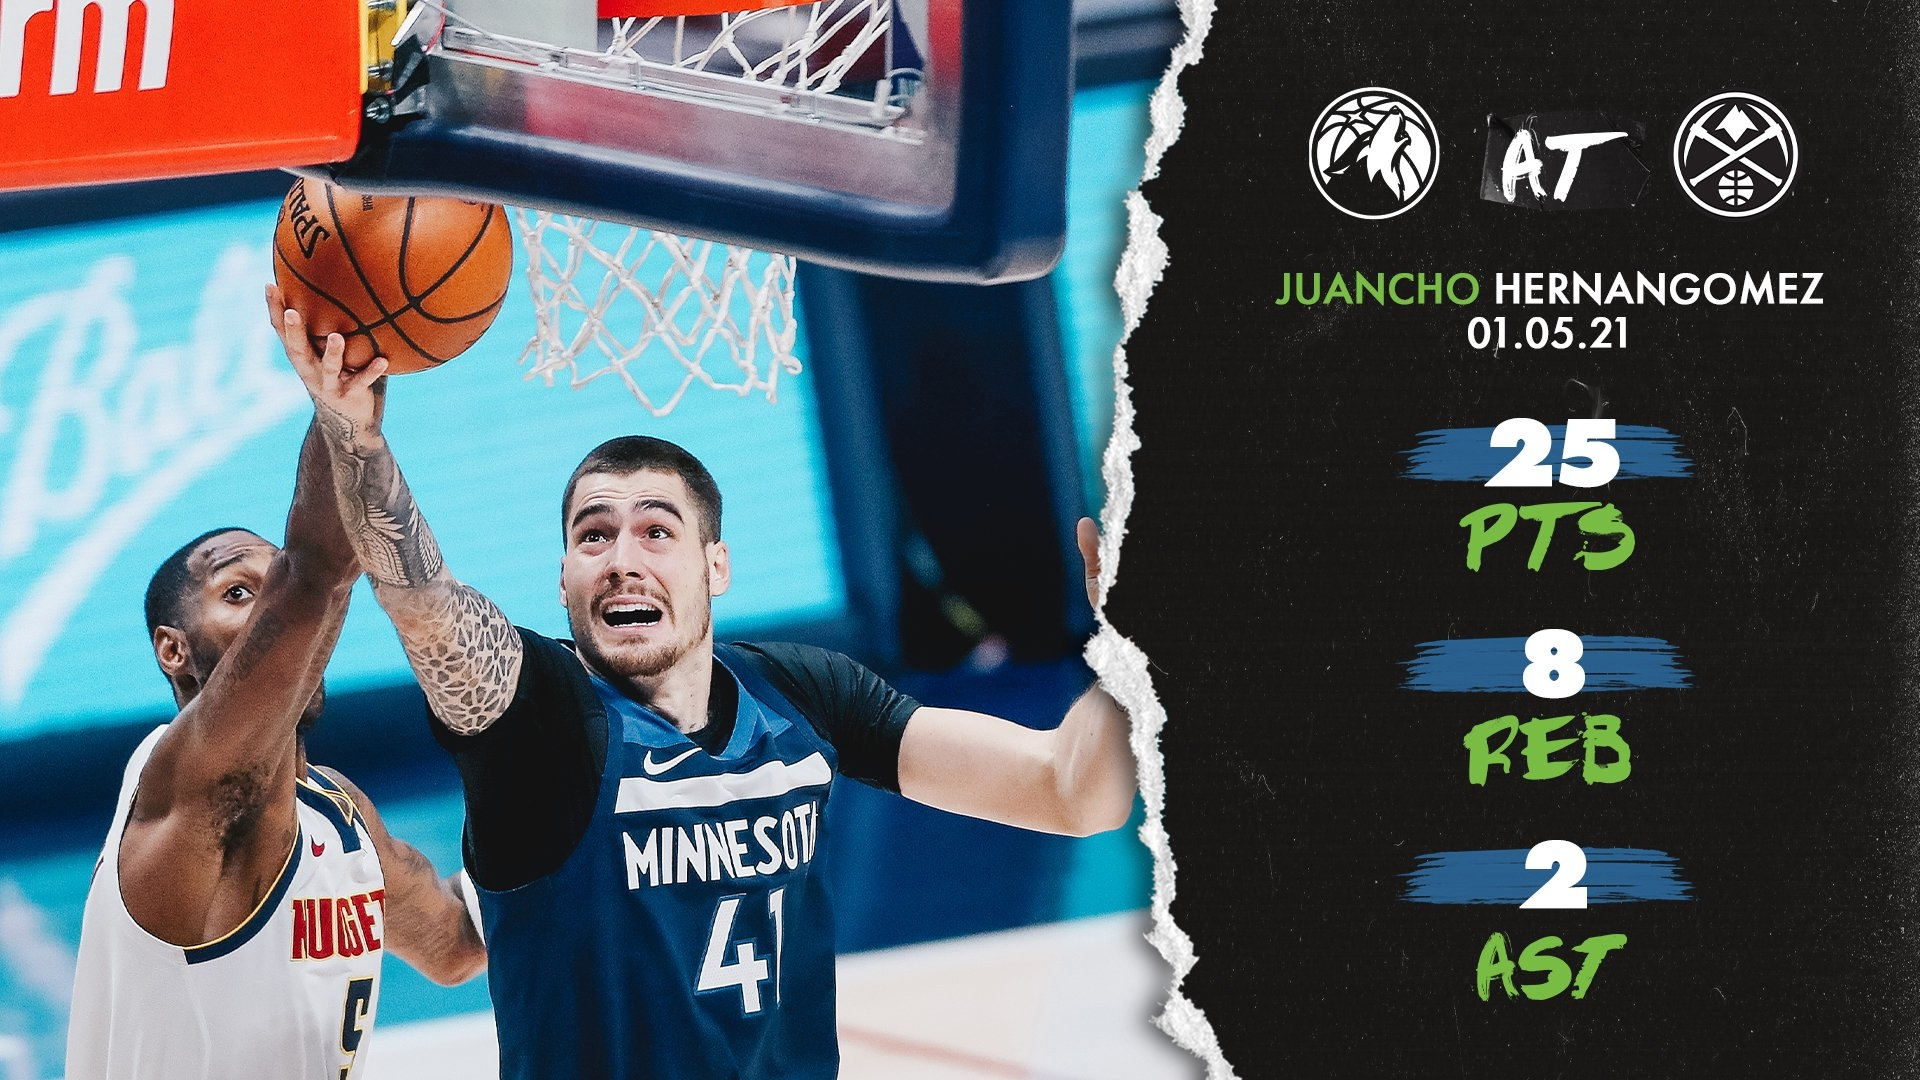 Highlights | Juancho Hernangómez (25 Pts., 8 Reb.) Vs. Nuggets - January 5, 2021 | Minnesota with 2021 Media Broadcast Calendar Printable